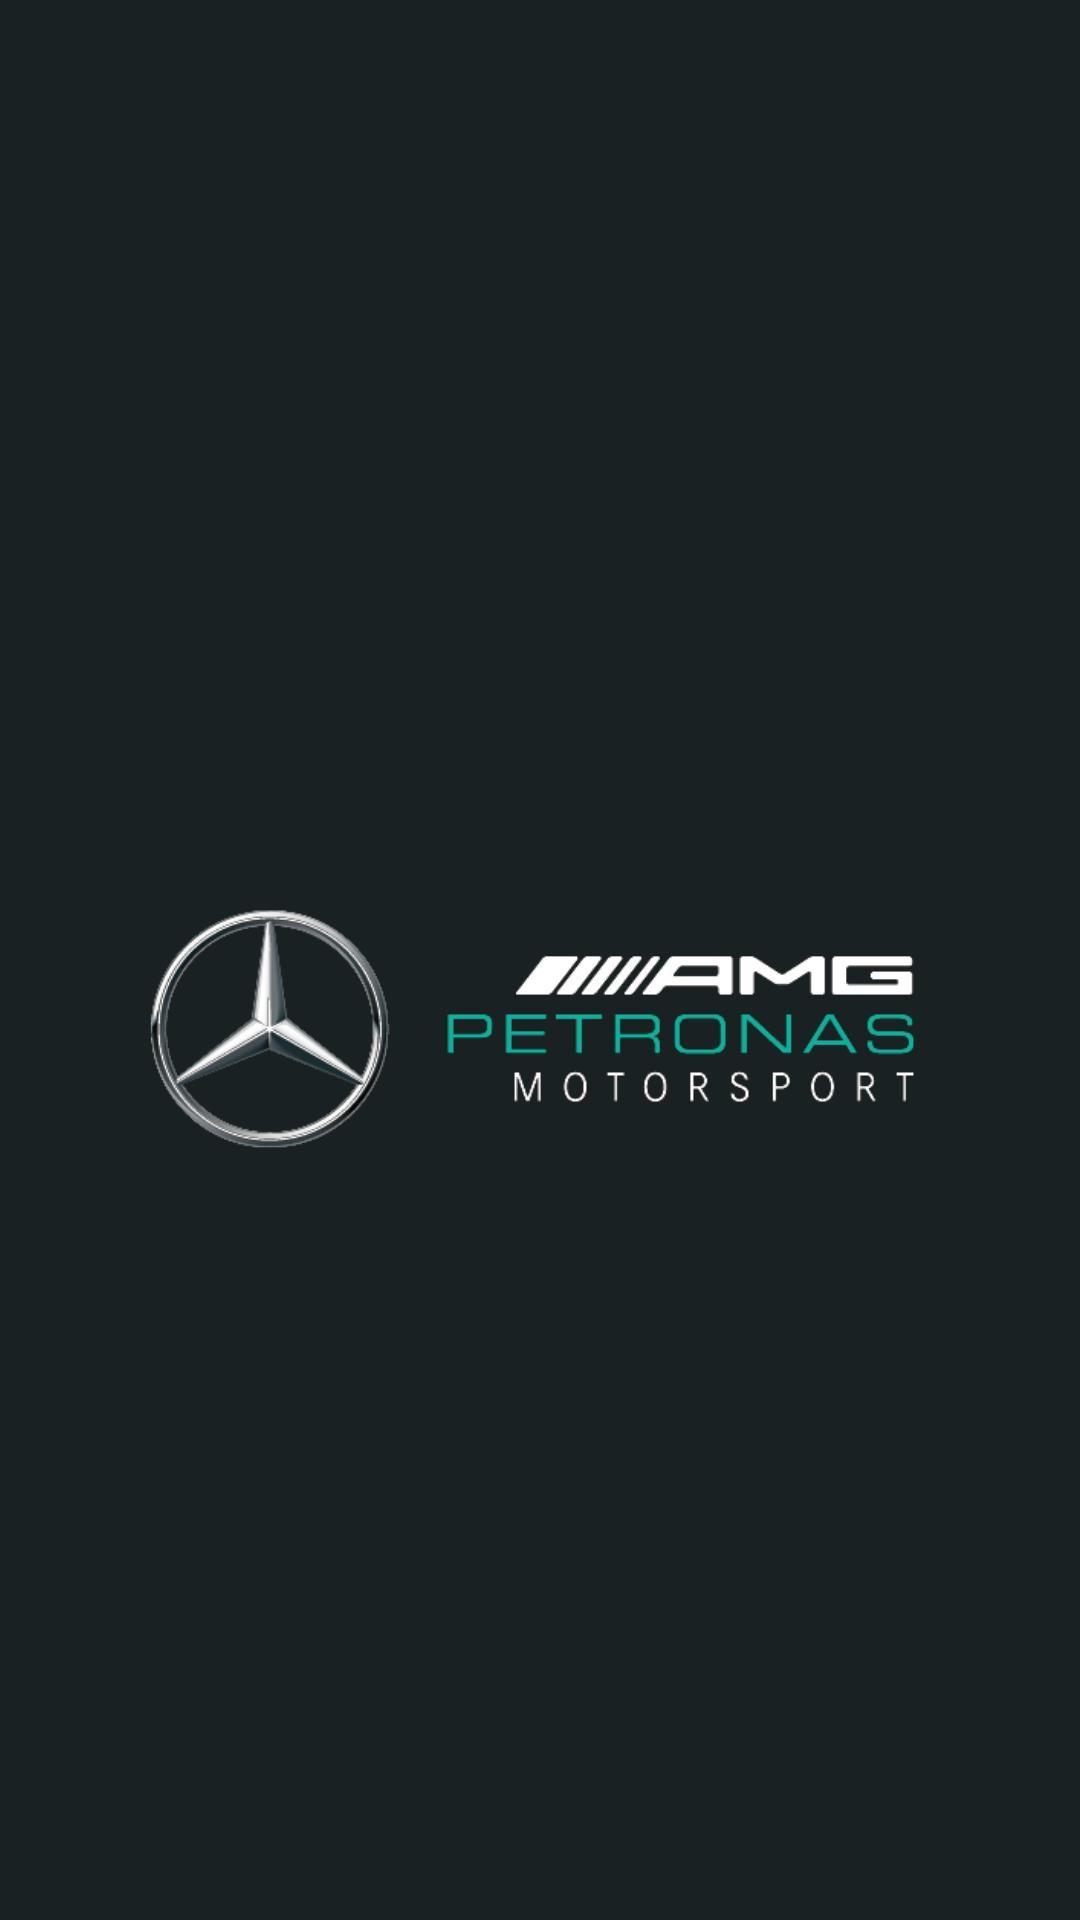 AMG Petronas Motorsports wallpaper teal | Fondos de ...